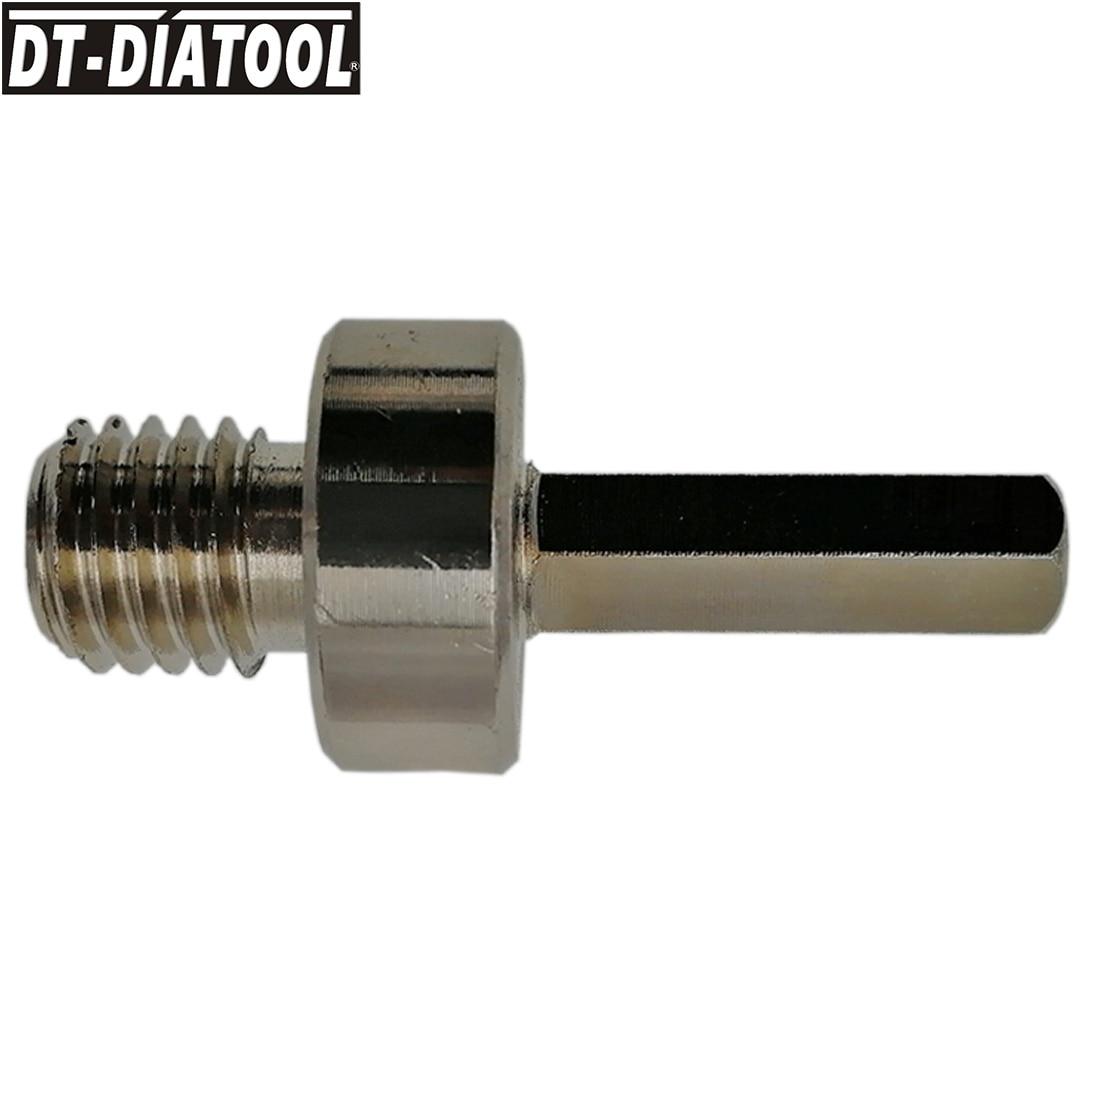 DT-DIATOOL 1 Pza M14 rosca macho a 3/8 adaptador de vástago hexagonal para taladro manual taladro eléctrico Cambio de rosca convertidor broca de núcleo